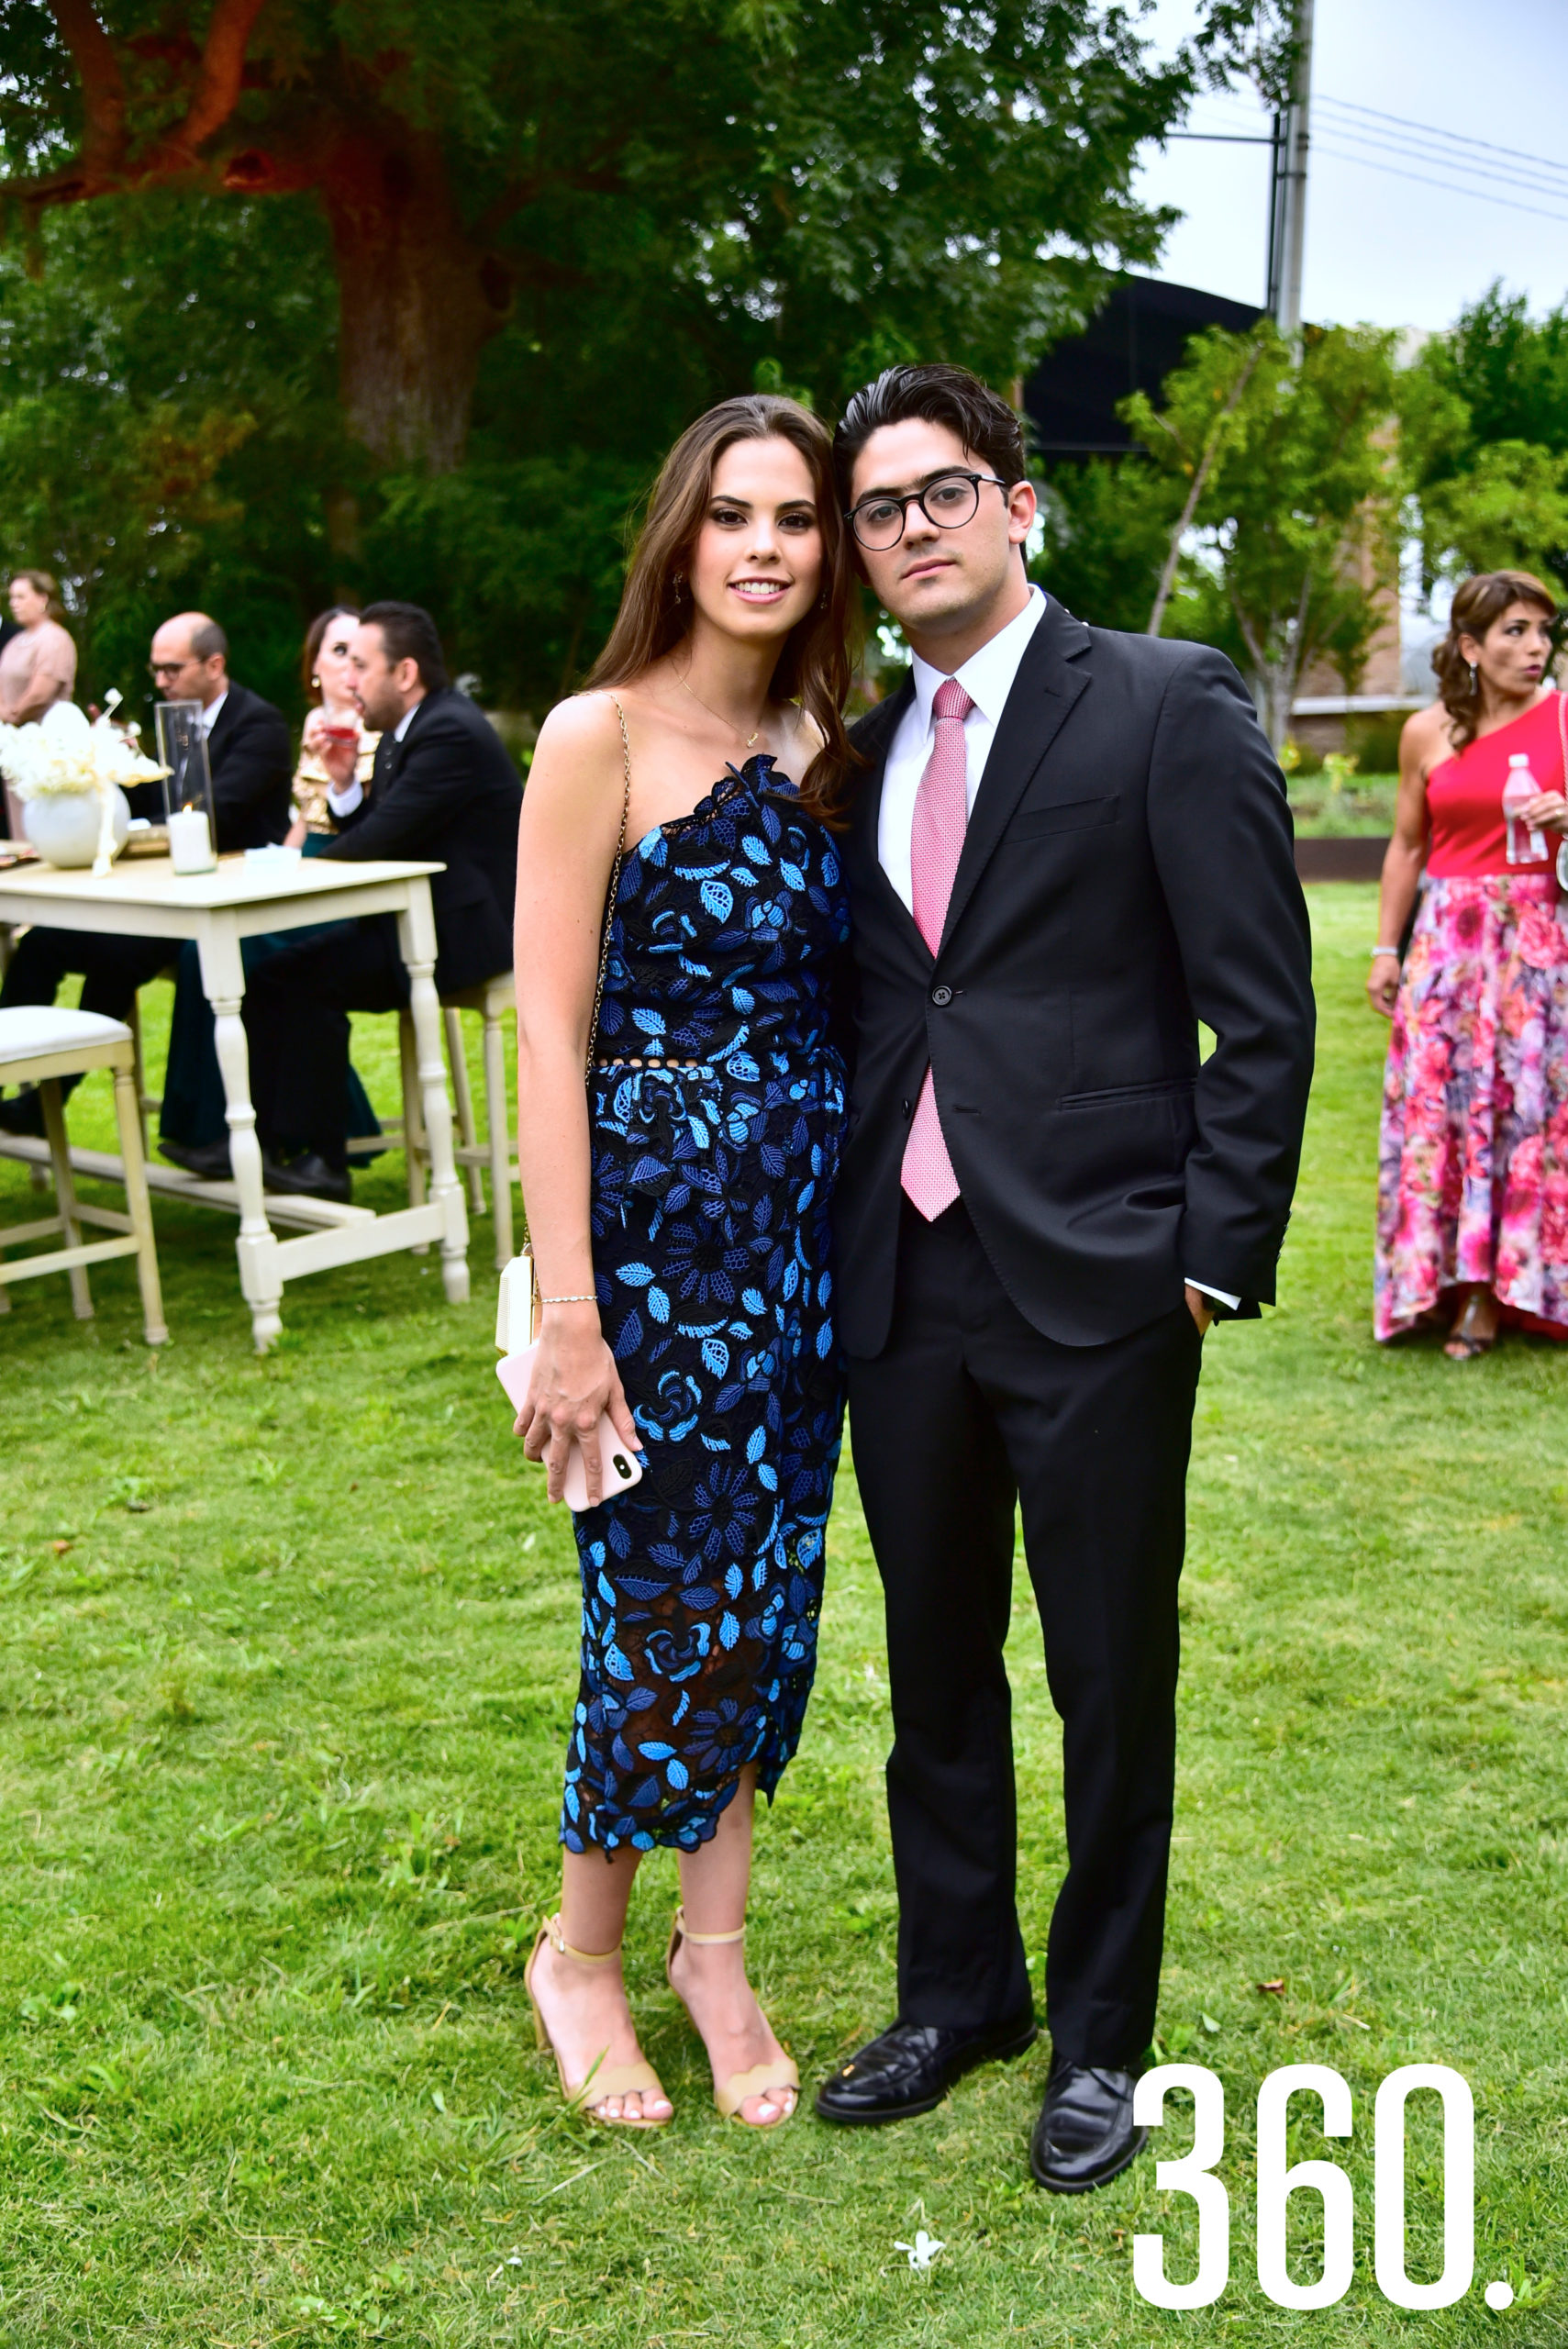 Lorena Sada y Hernán Dávila